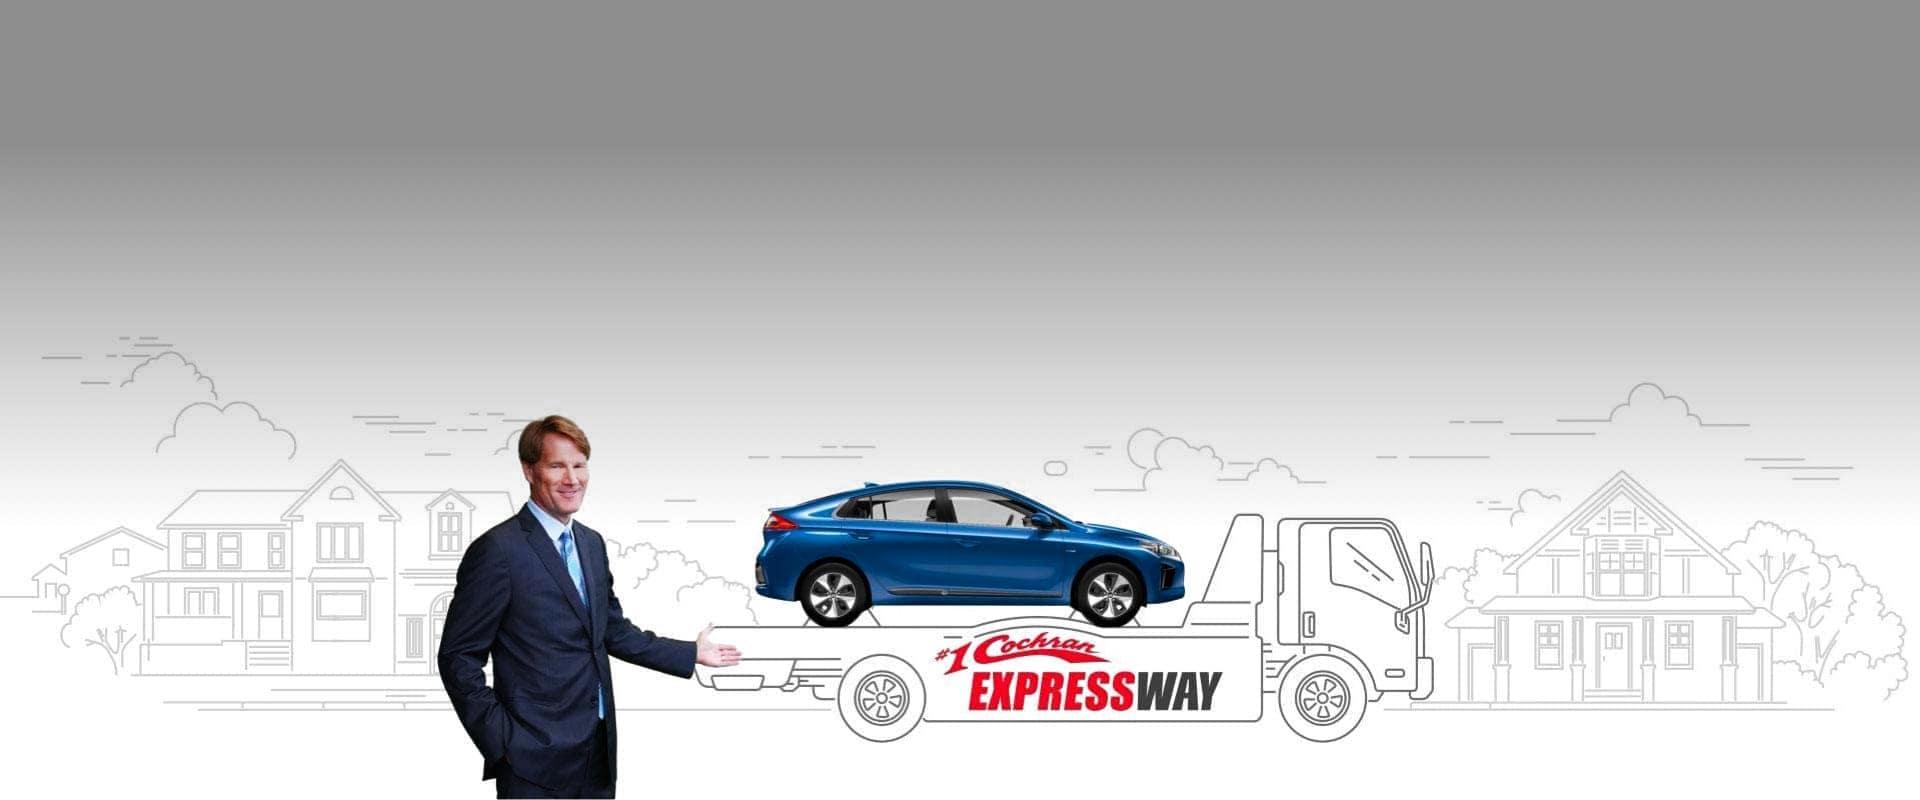 expressway-tow-hero-slide enhanced